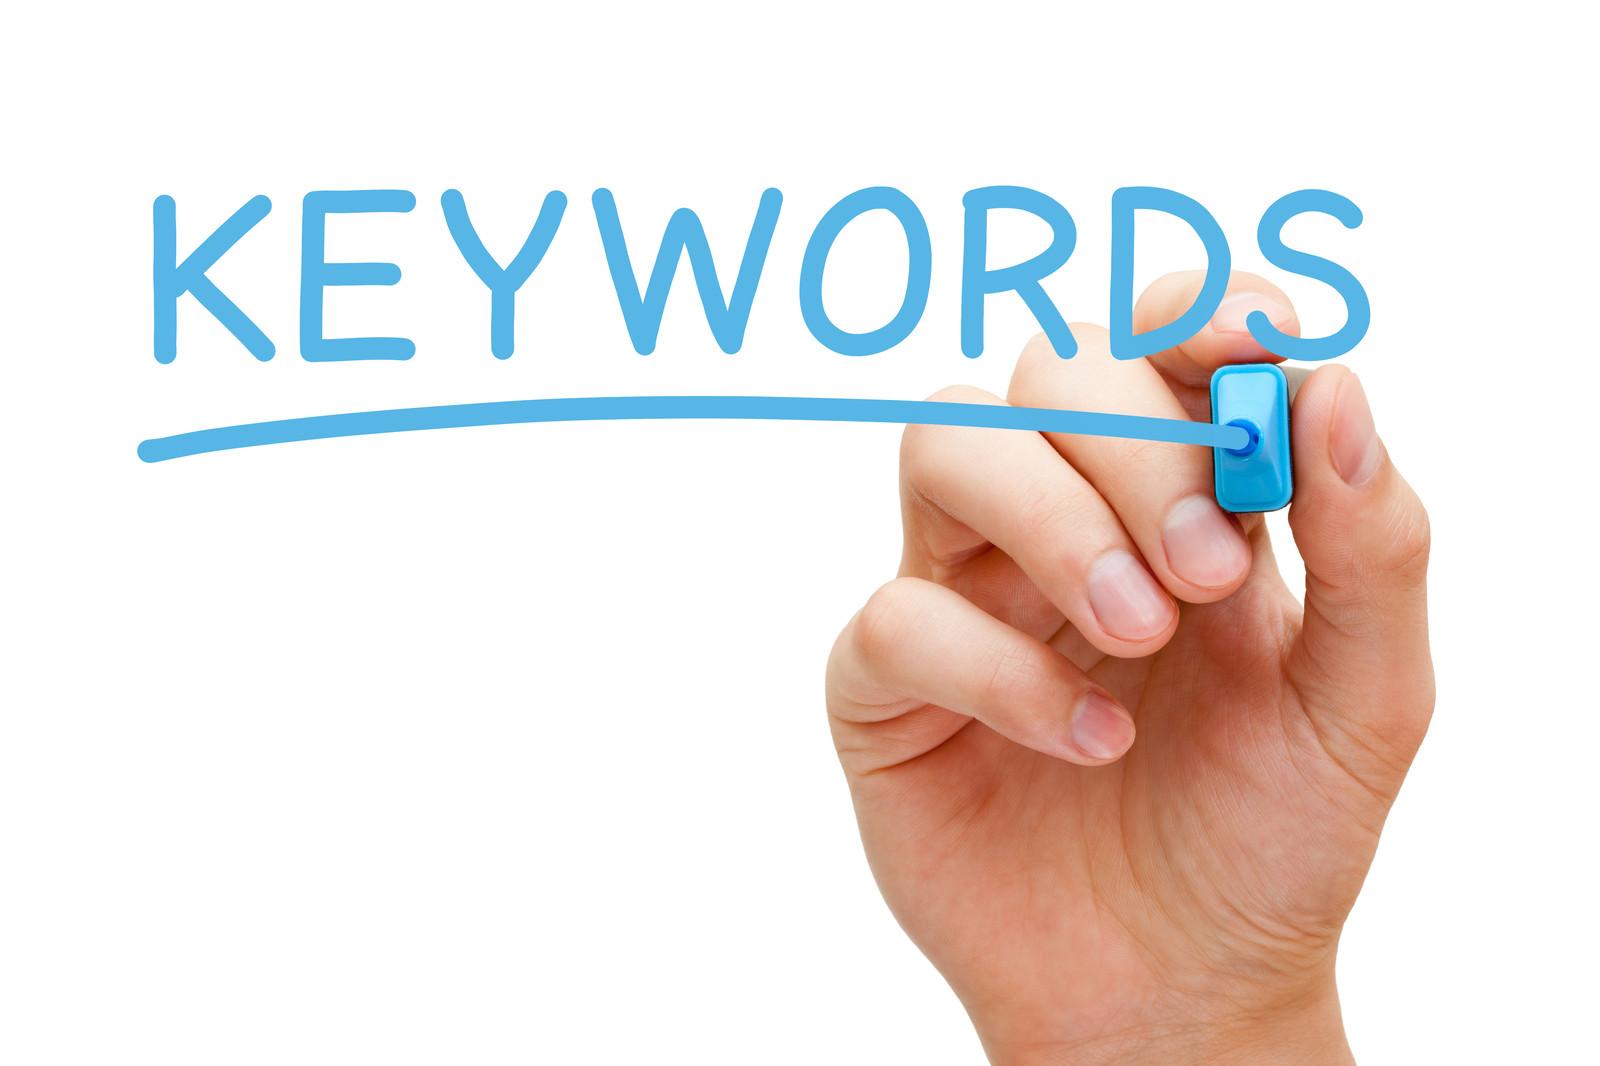 Langkah Yang Perlu Dipertimbangkan Dalam Riset Kata Kunci